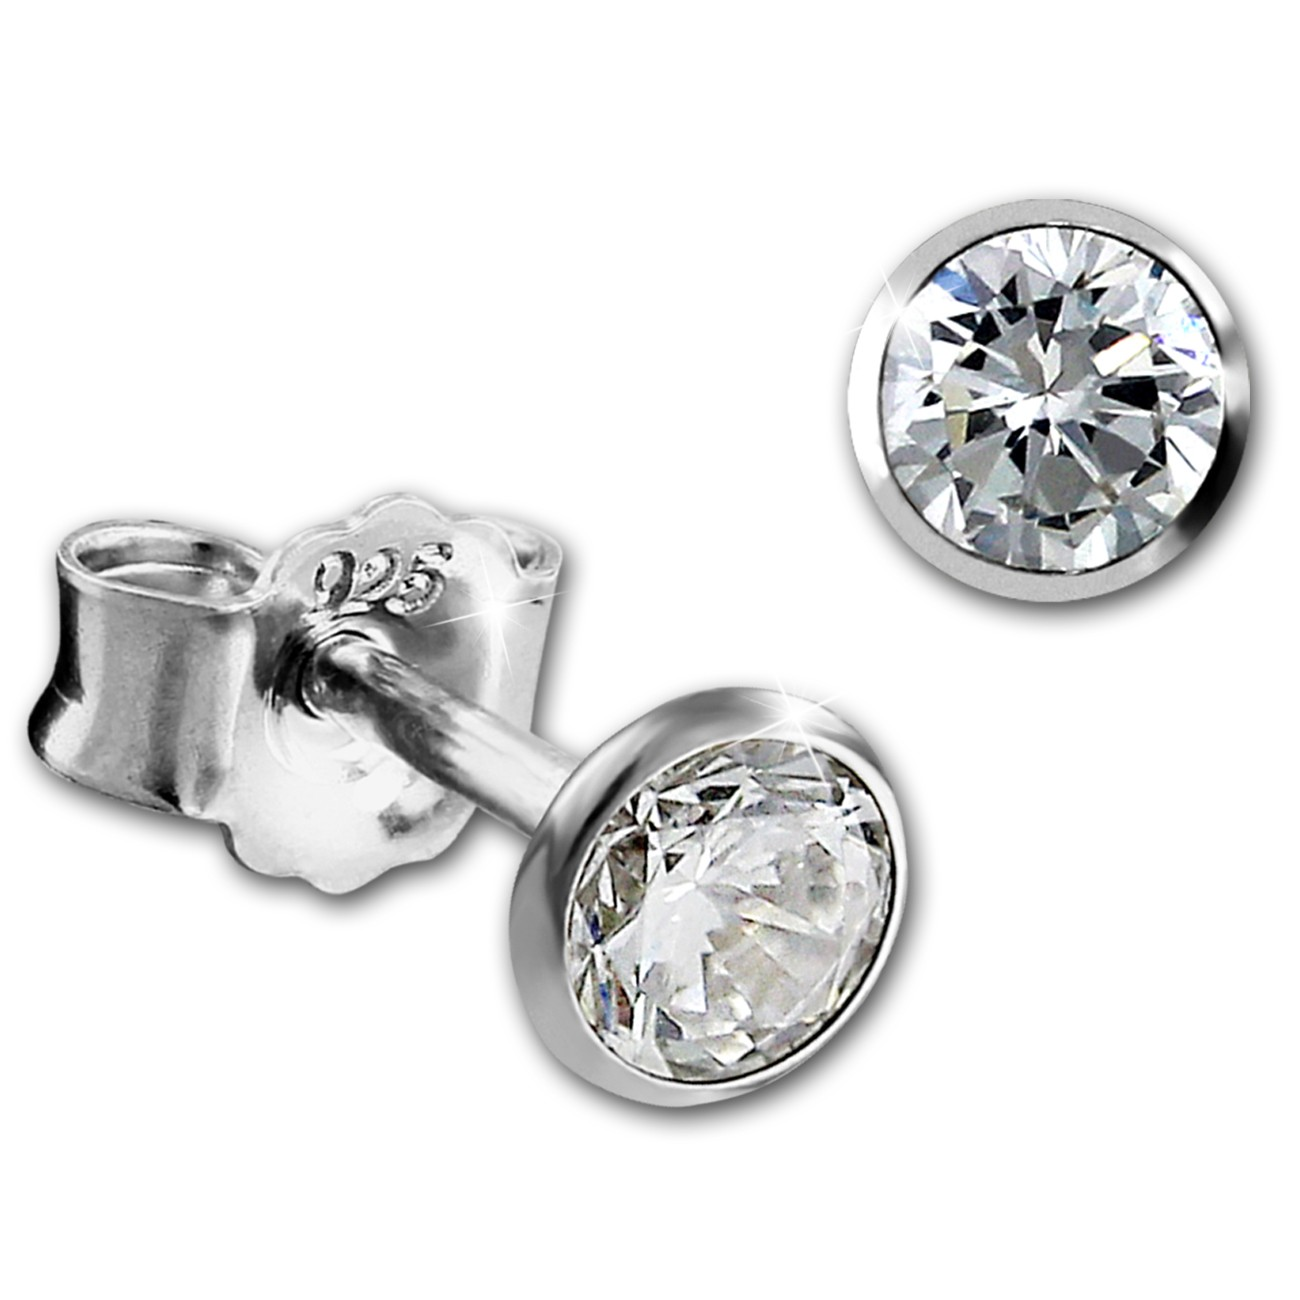 SilberDream Ohrringe Zirkonia weiß 4mm 925 Silber Ohrstecker SDO9204W